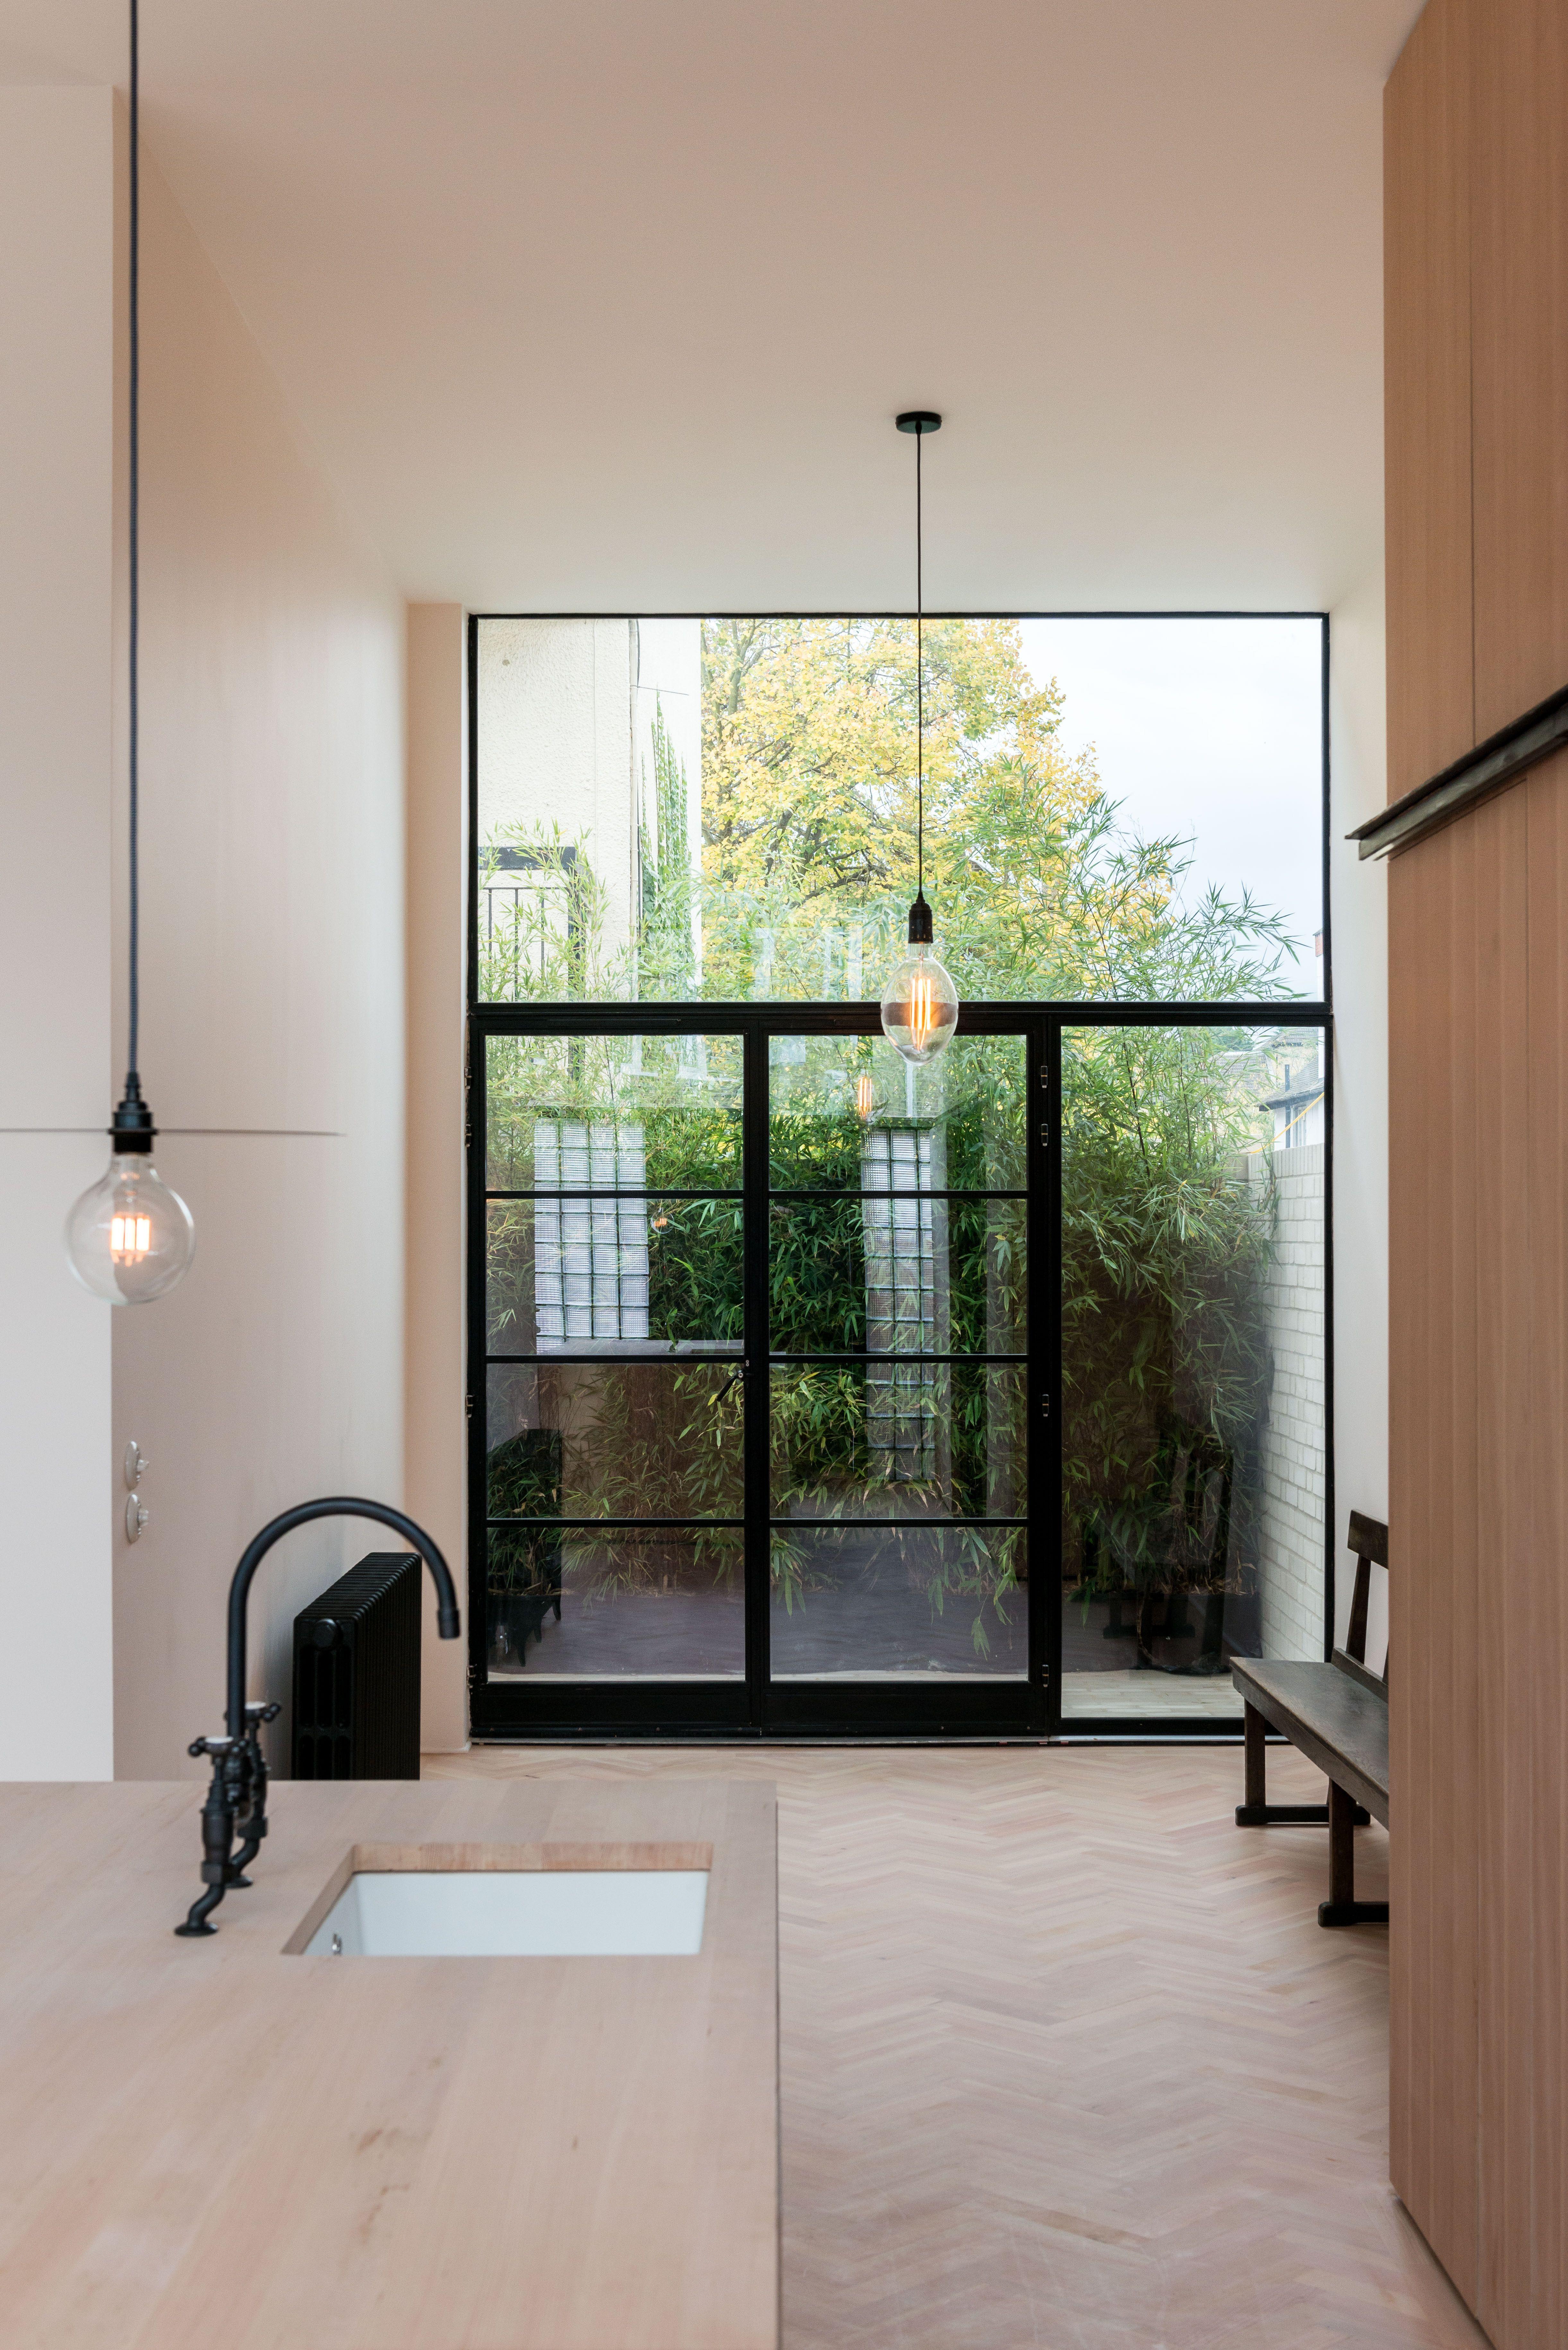 Pin von Els Van Rompaey auf Modern interieur/exterieur   Pinterest ...